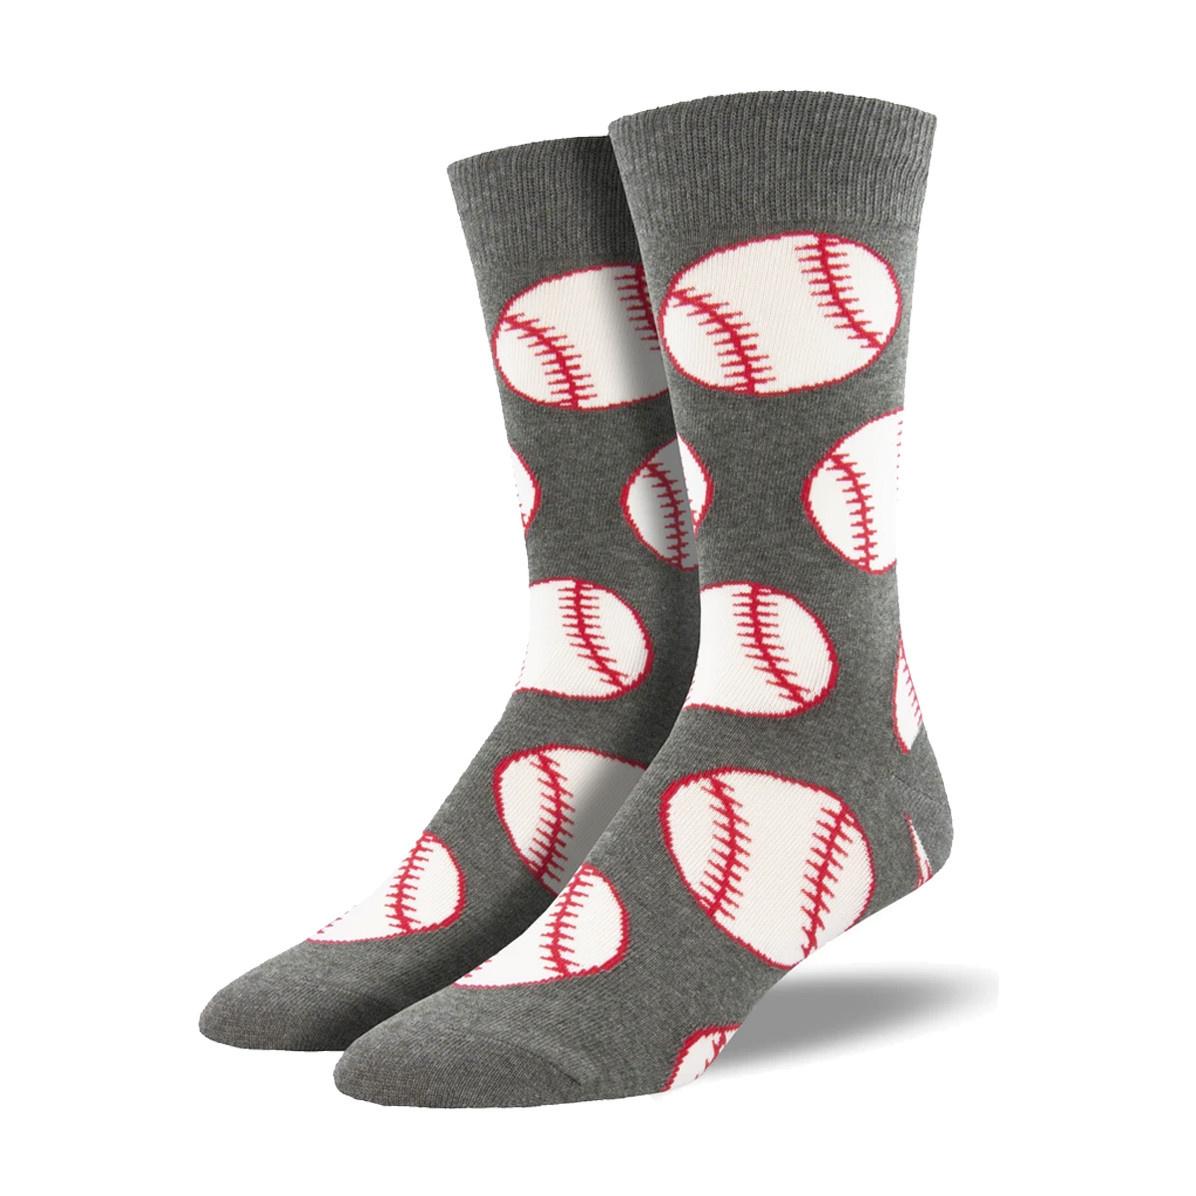 Socksmith Socksmith Men's Cotton Crew Socks Ball Game Grey